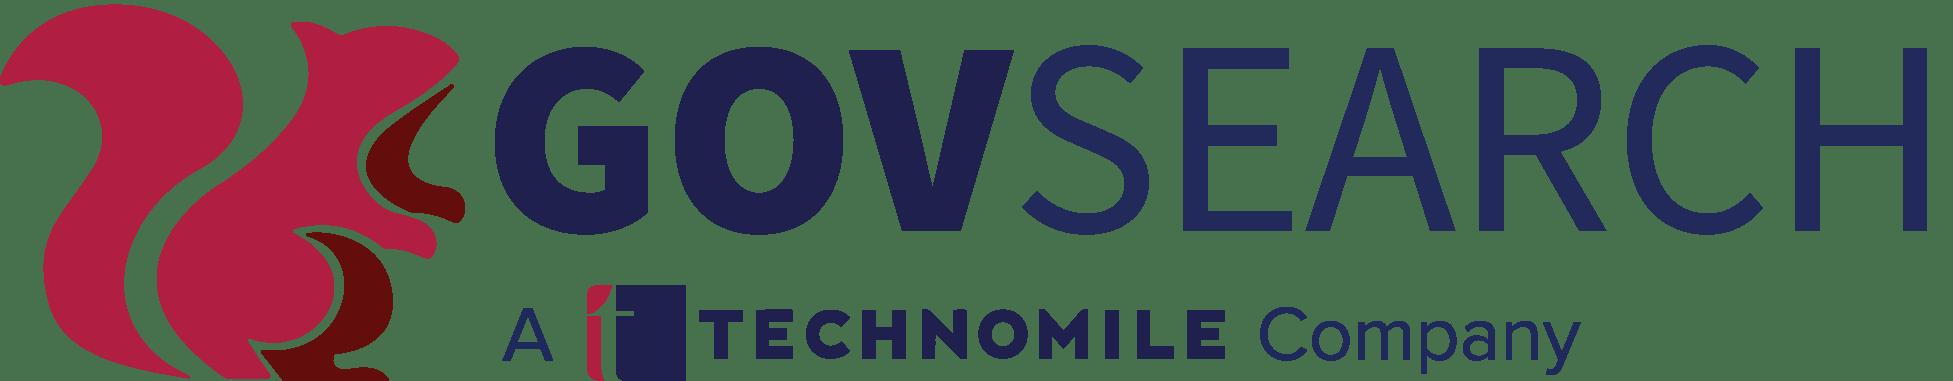 govsearch logo